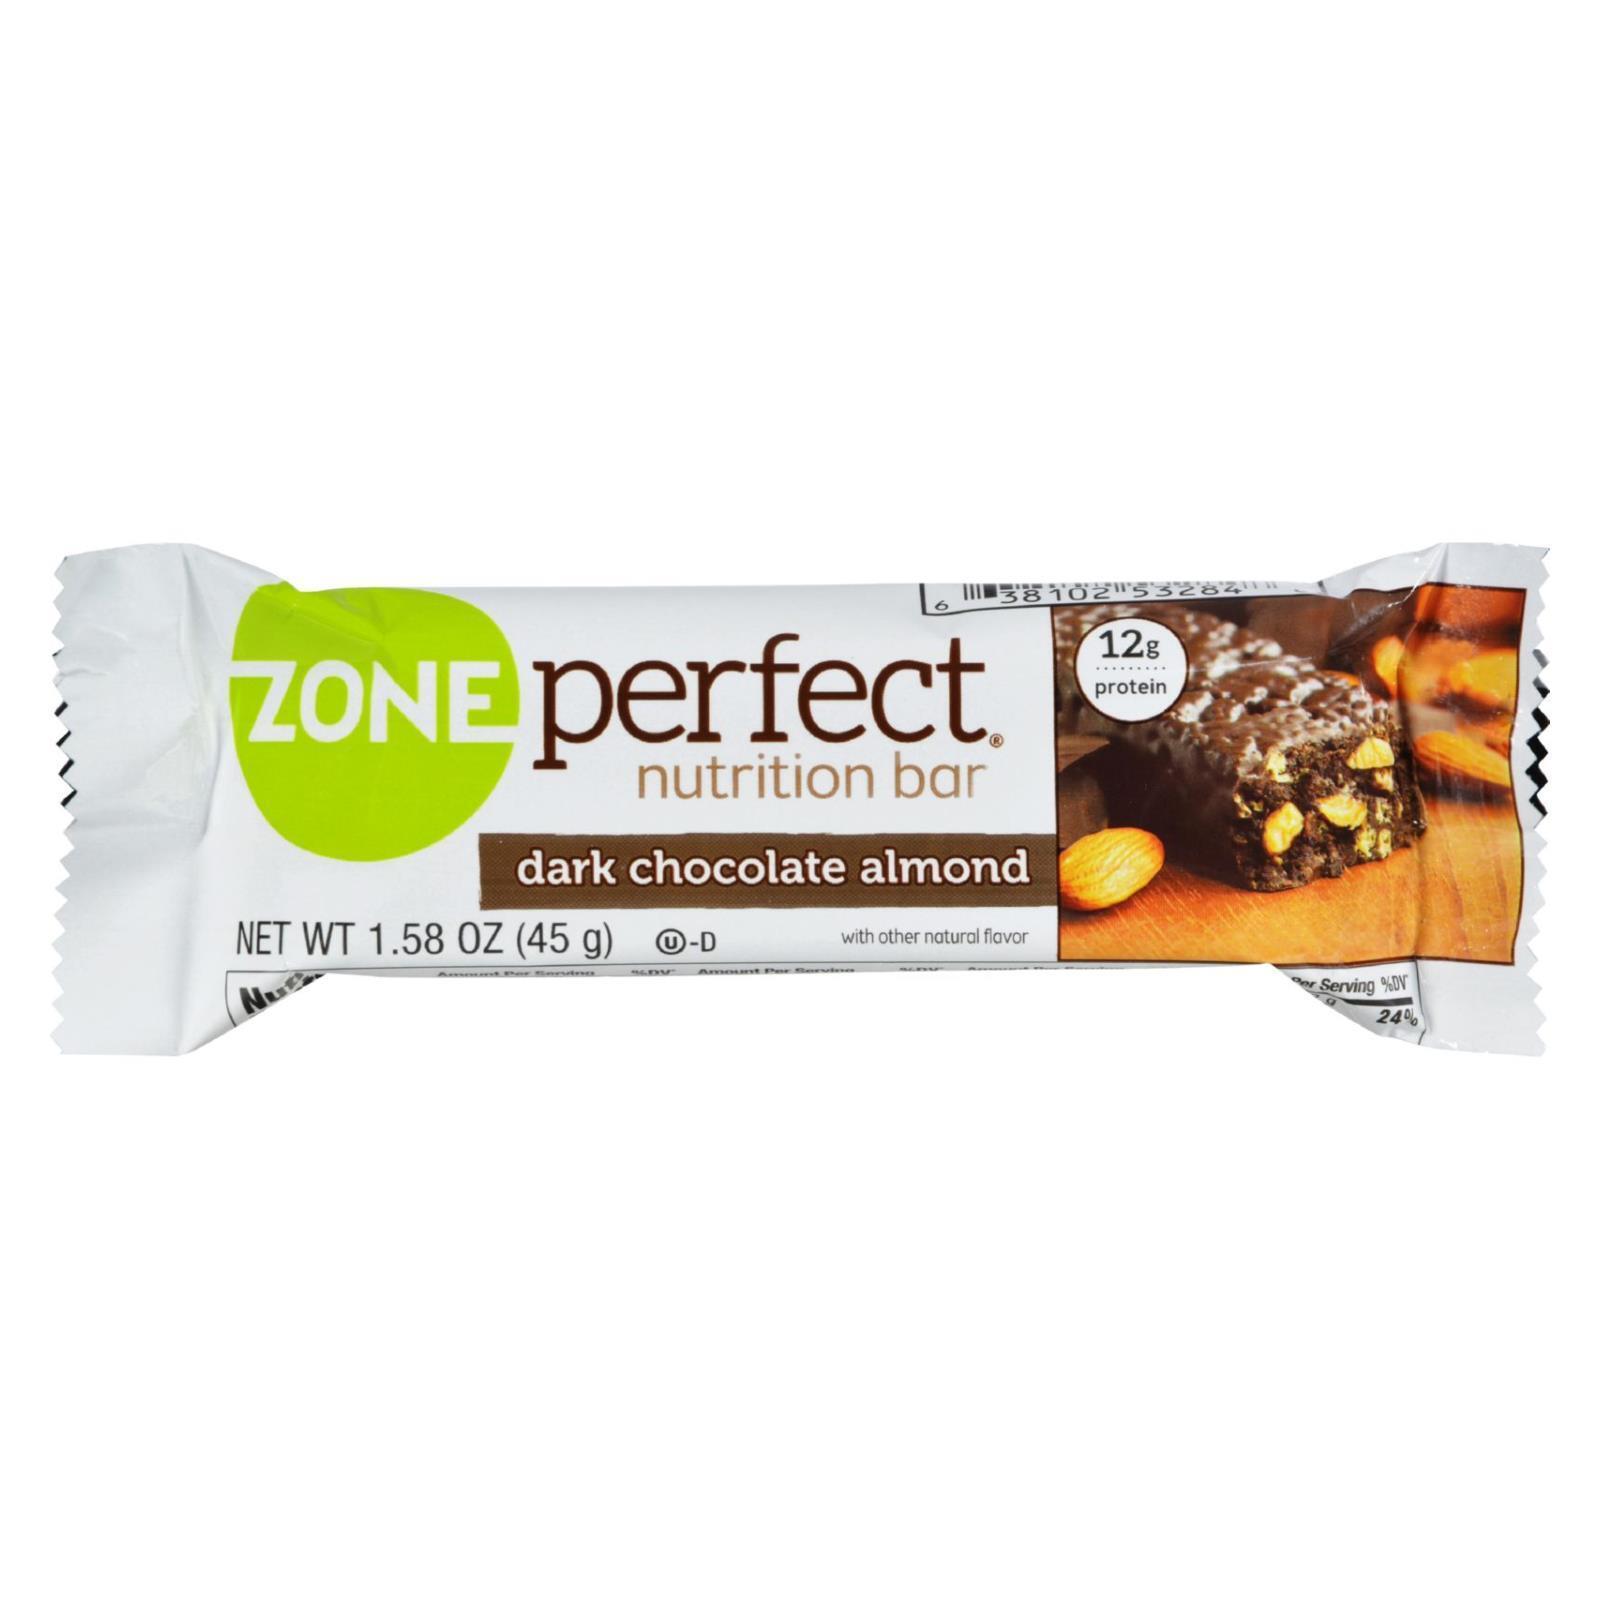 Zone Nutrition Bar - Dark Chocolate Almond - Case of 12 - 1.58 oz